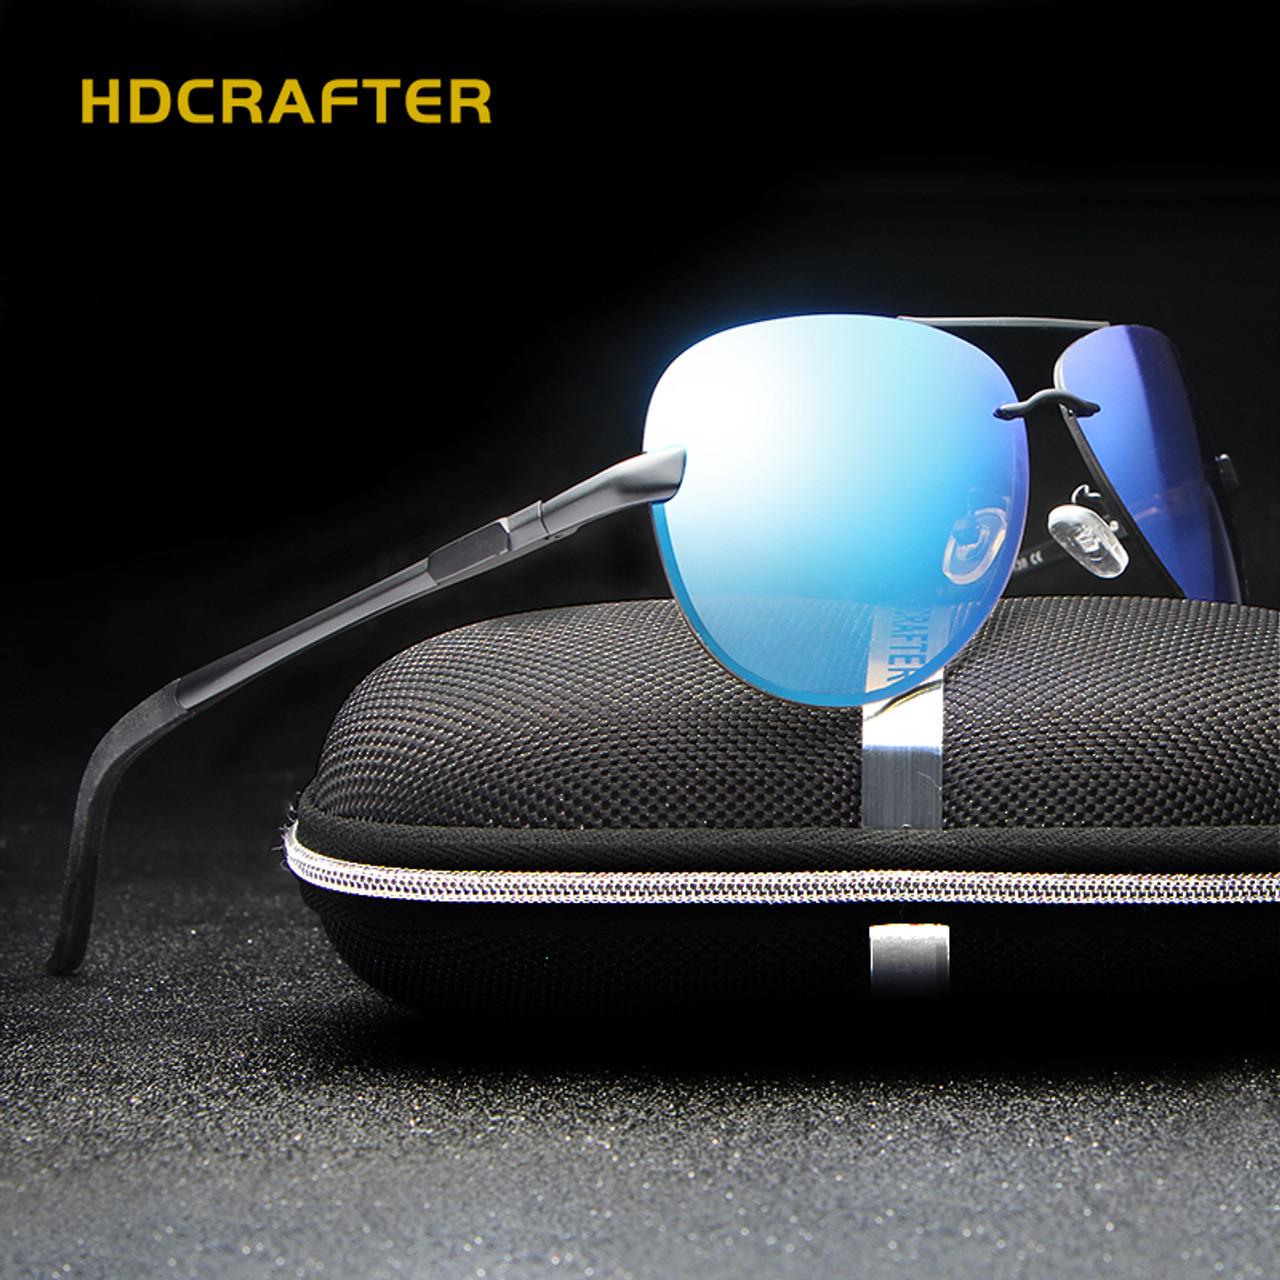 9f690ff927 ... HDCRAFTER Aluminum magnesium polarized aviation Sunglasses men driving sun  Glasses vintage oculos de sol ...